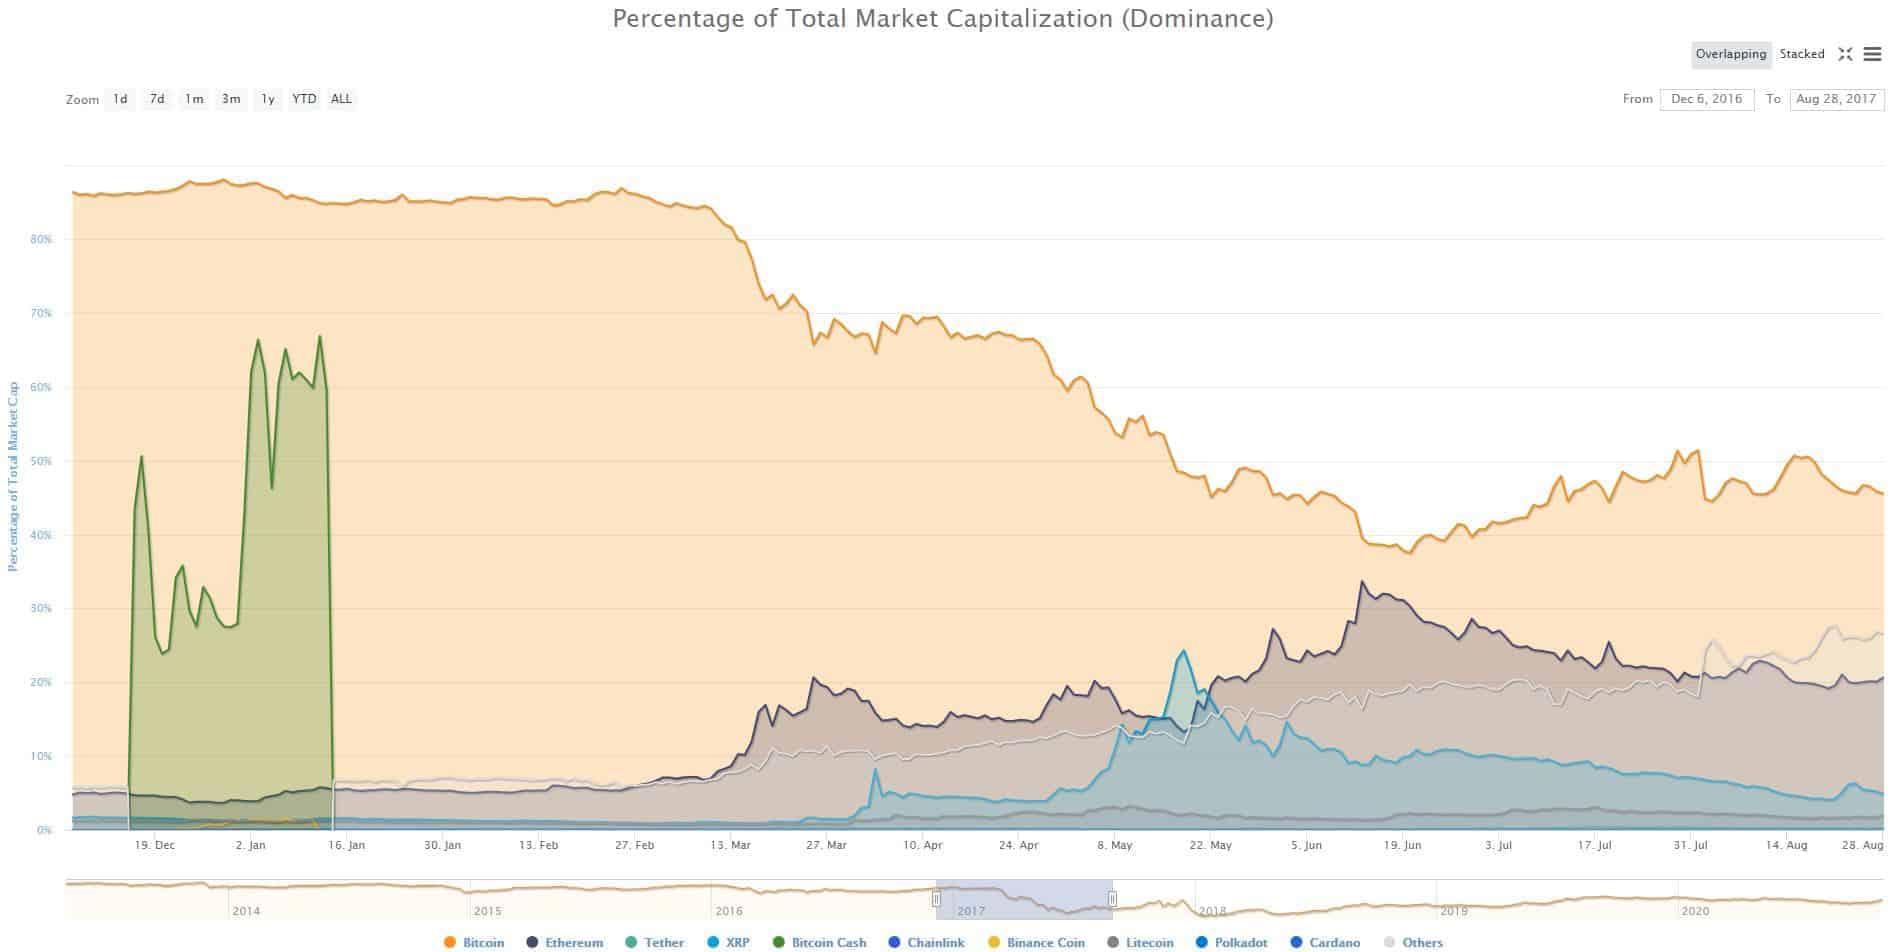 Bitcoins Vs. Altcoins Market Dominance Dec 2016 - Aug 2017. Source: CoinMarketCap